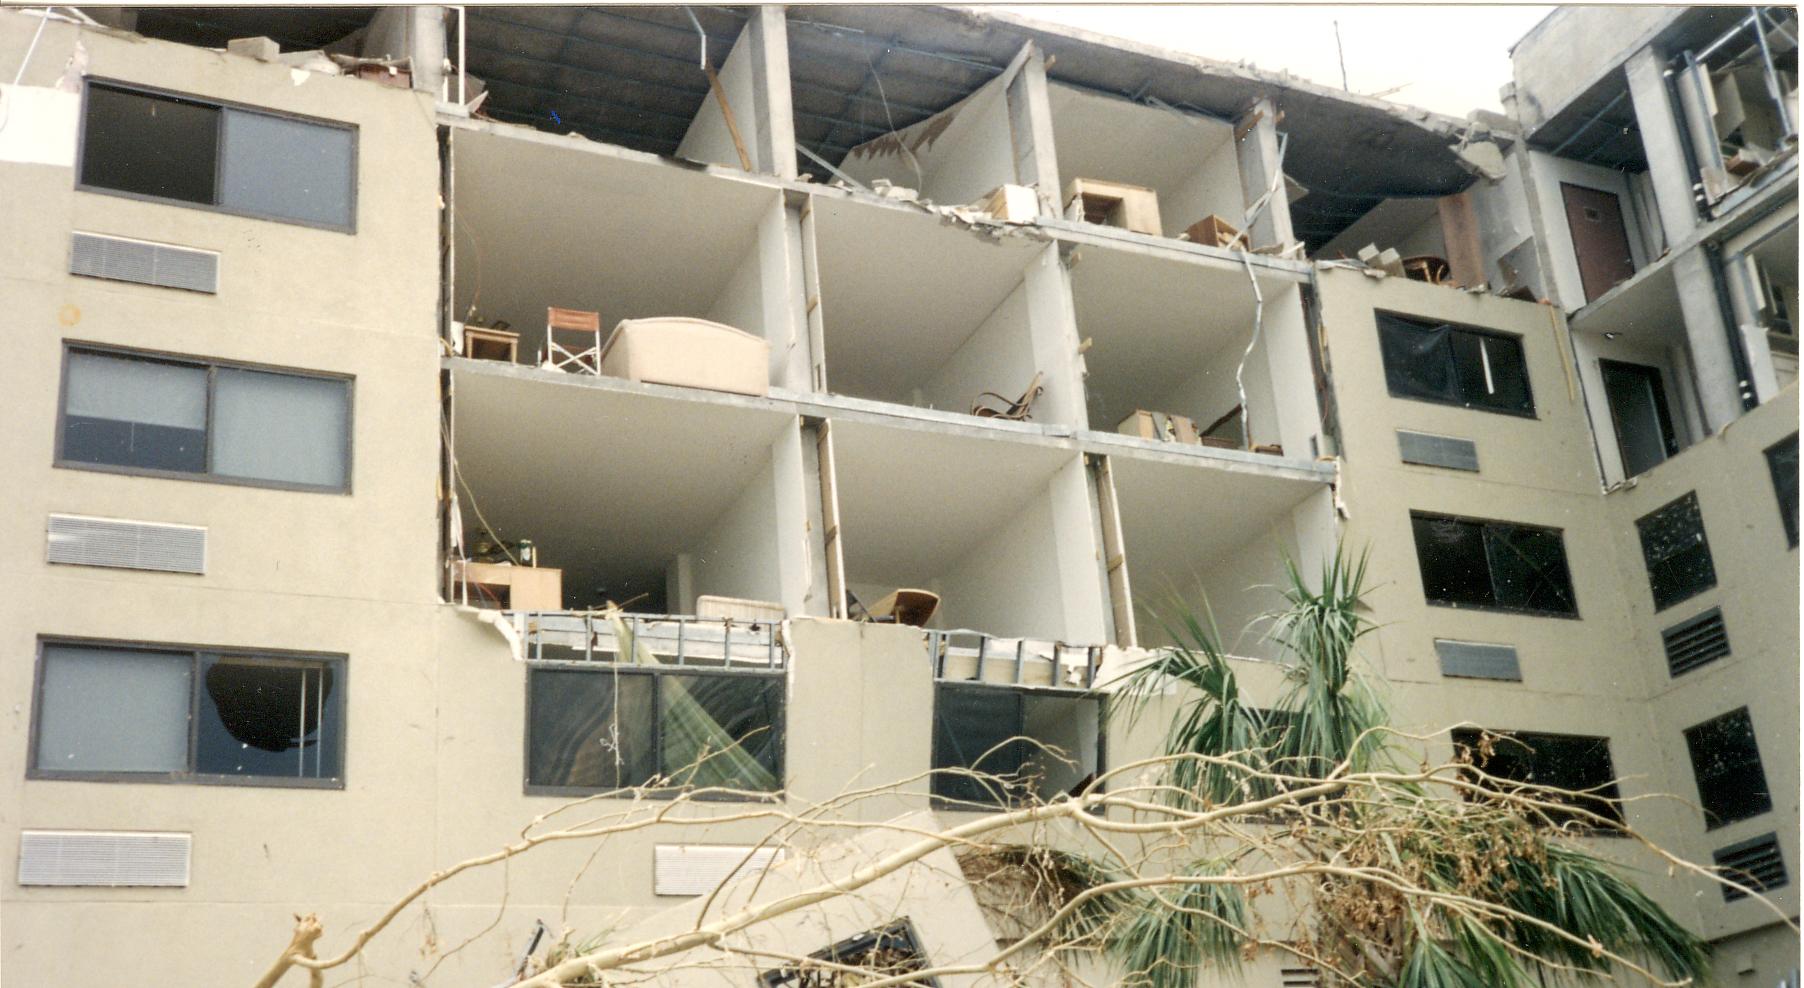 Multi-Family Condo Property Damage Claim Adjusters International